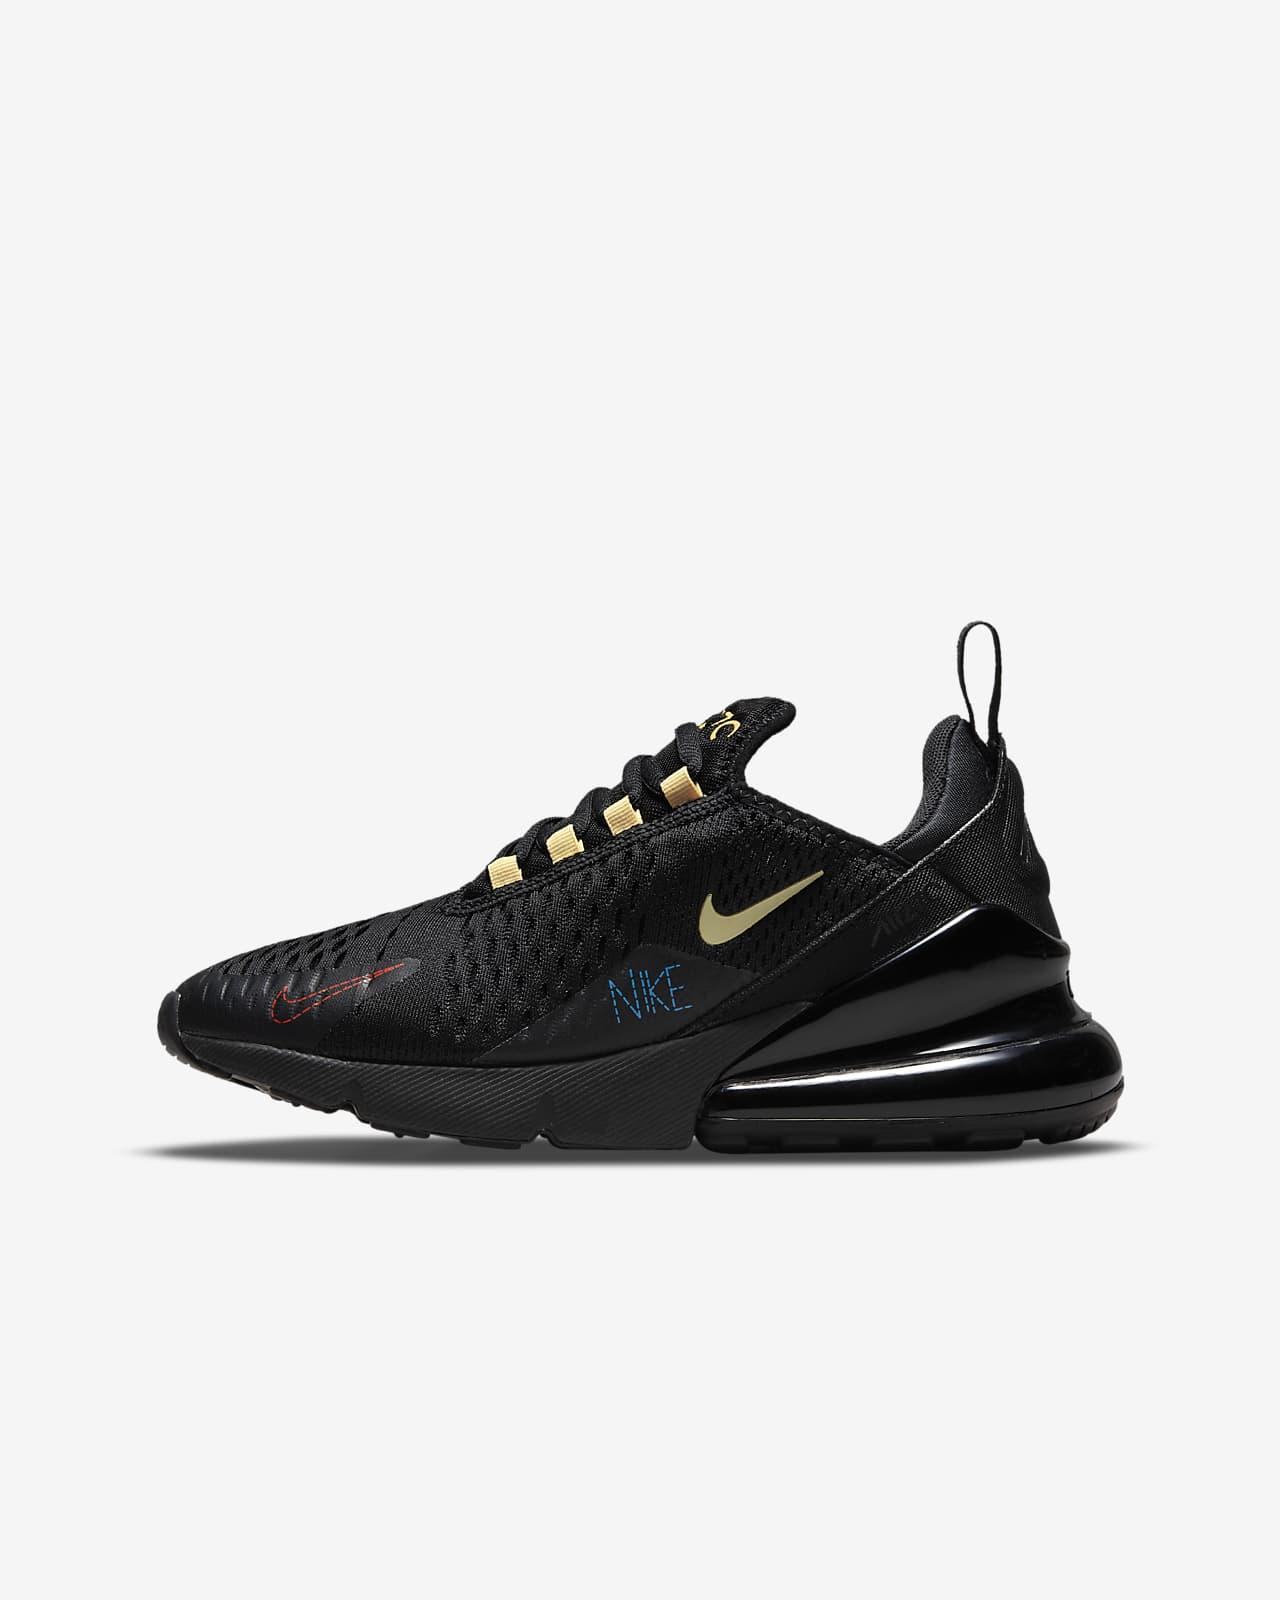 Nike Air Max 270 Schuhe für ältere Kinder